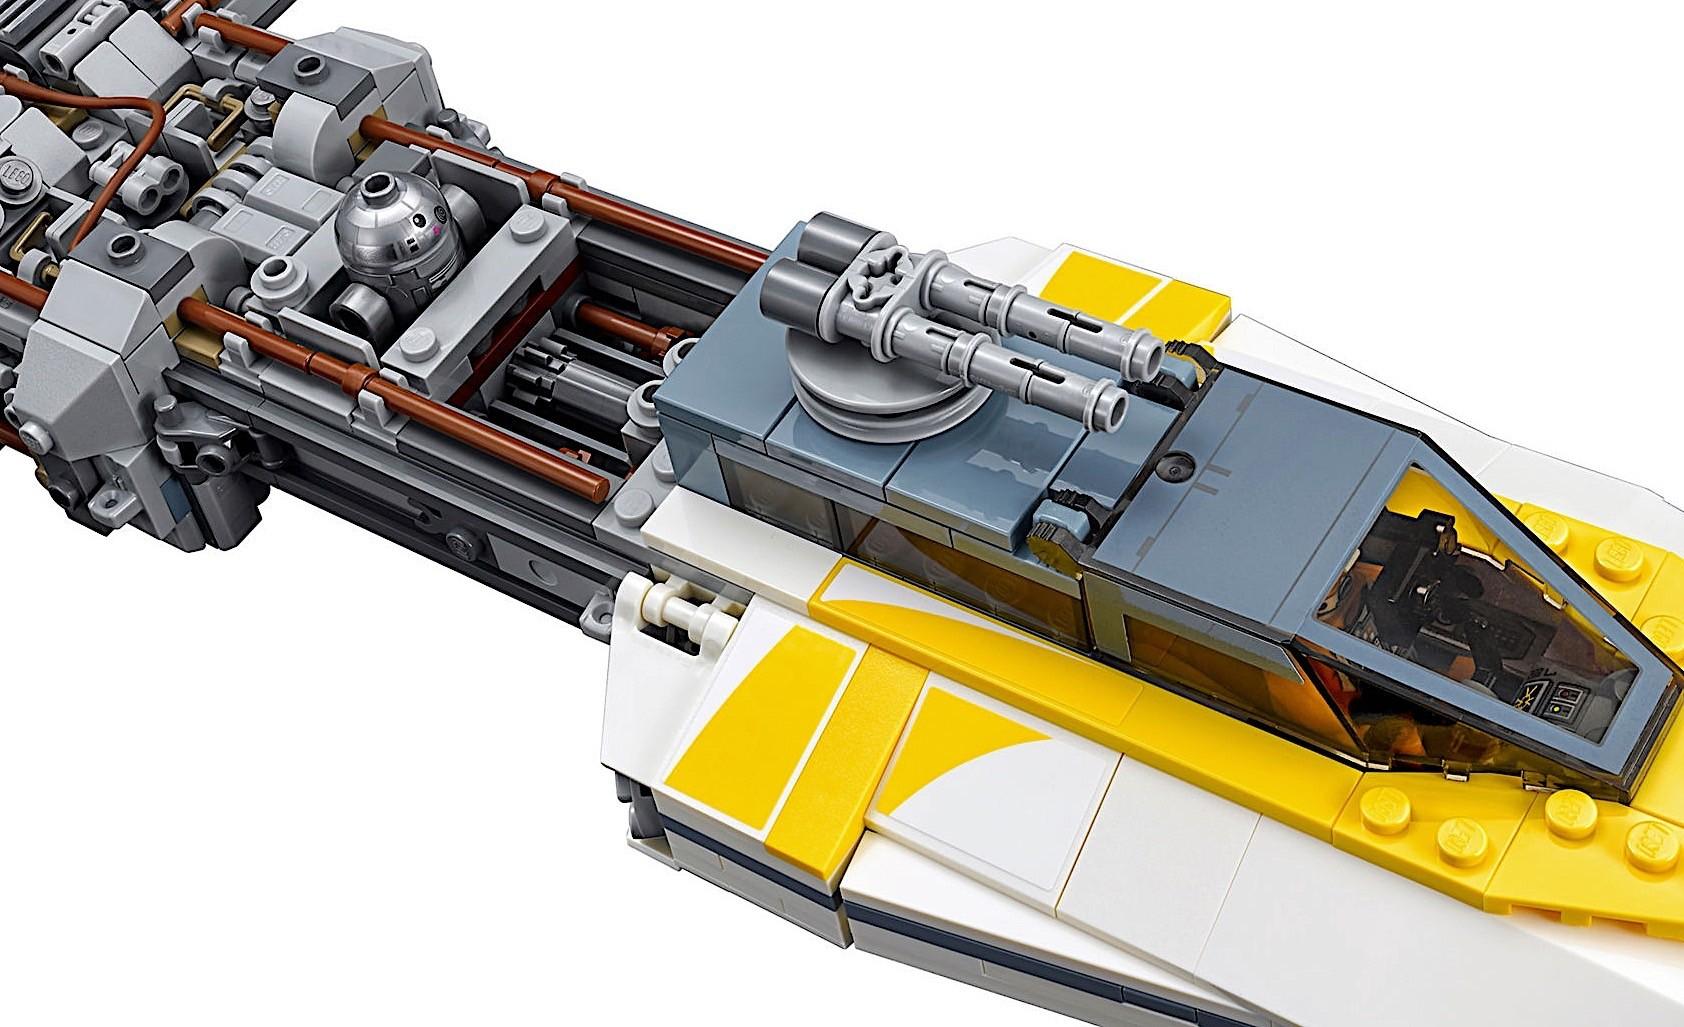 Lego Star Wars Y Wing Will Make You Forget Luke Skywalker Milked A